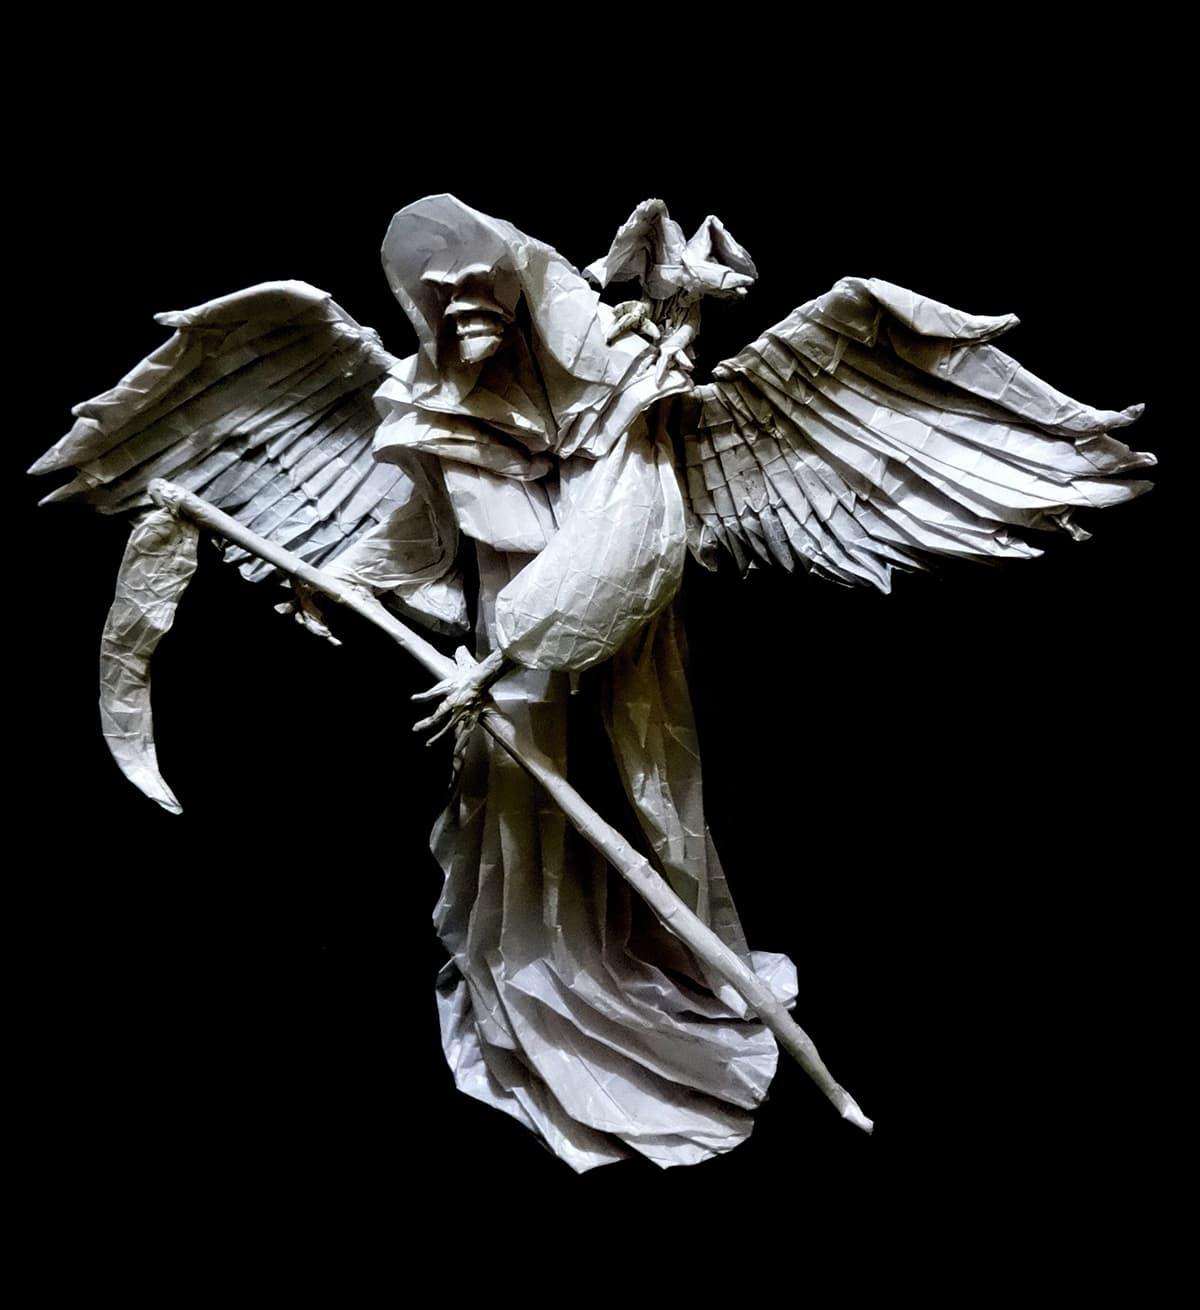 Origami Grim Reaper by Neelesh Kumar